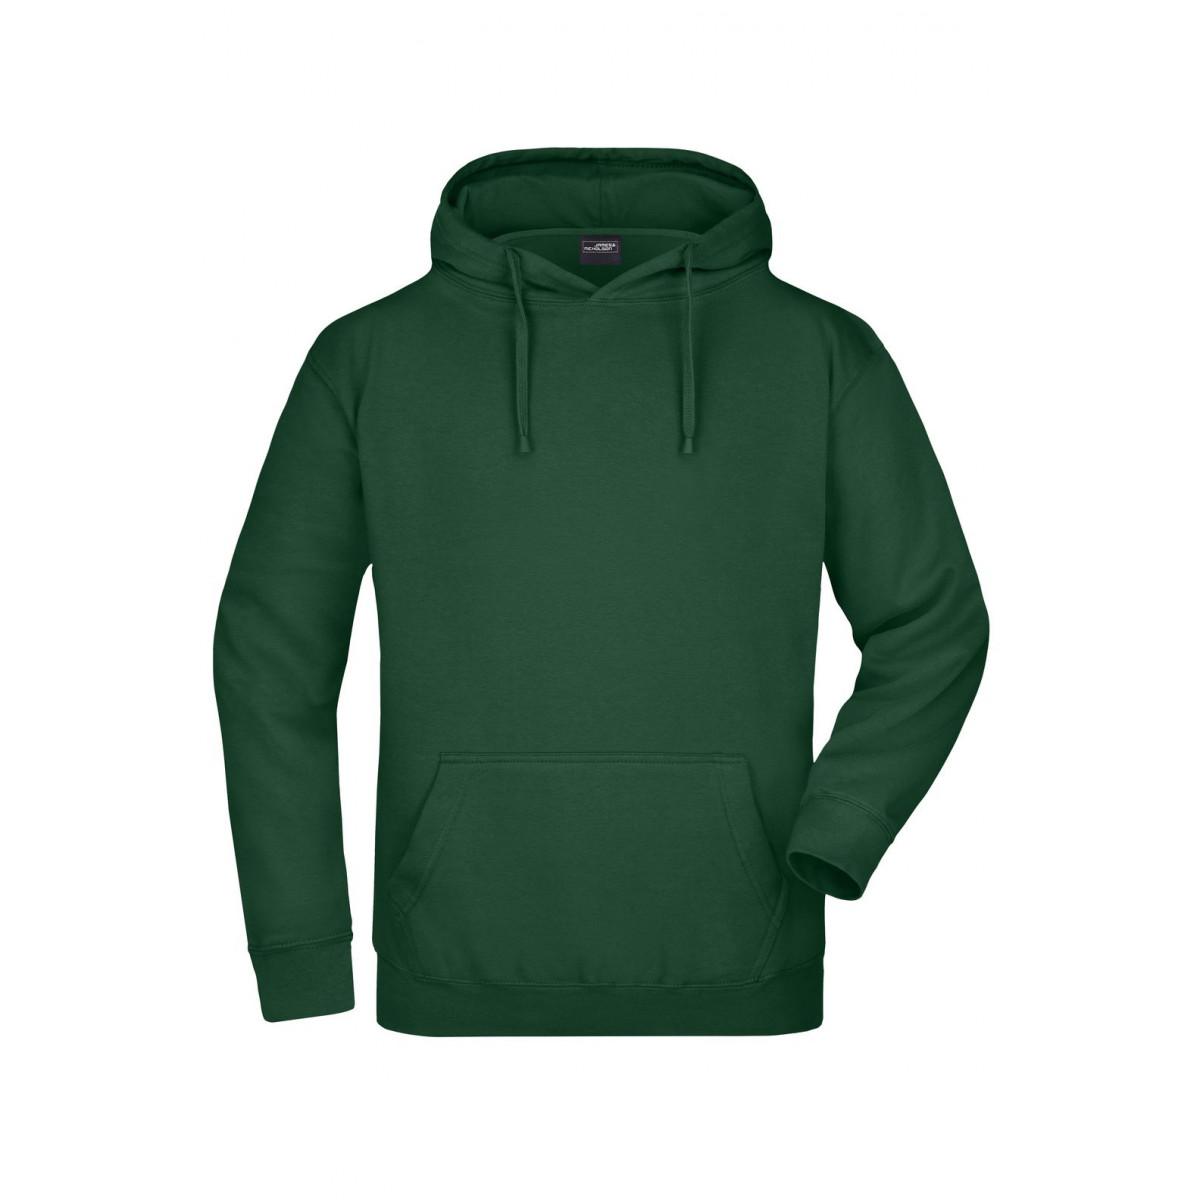 Толстовка мужская JN047 Hooded Sweat - Темно-зеленый